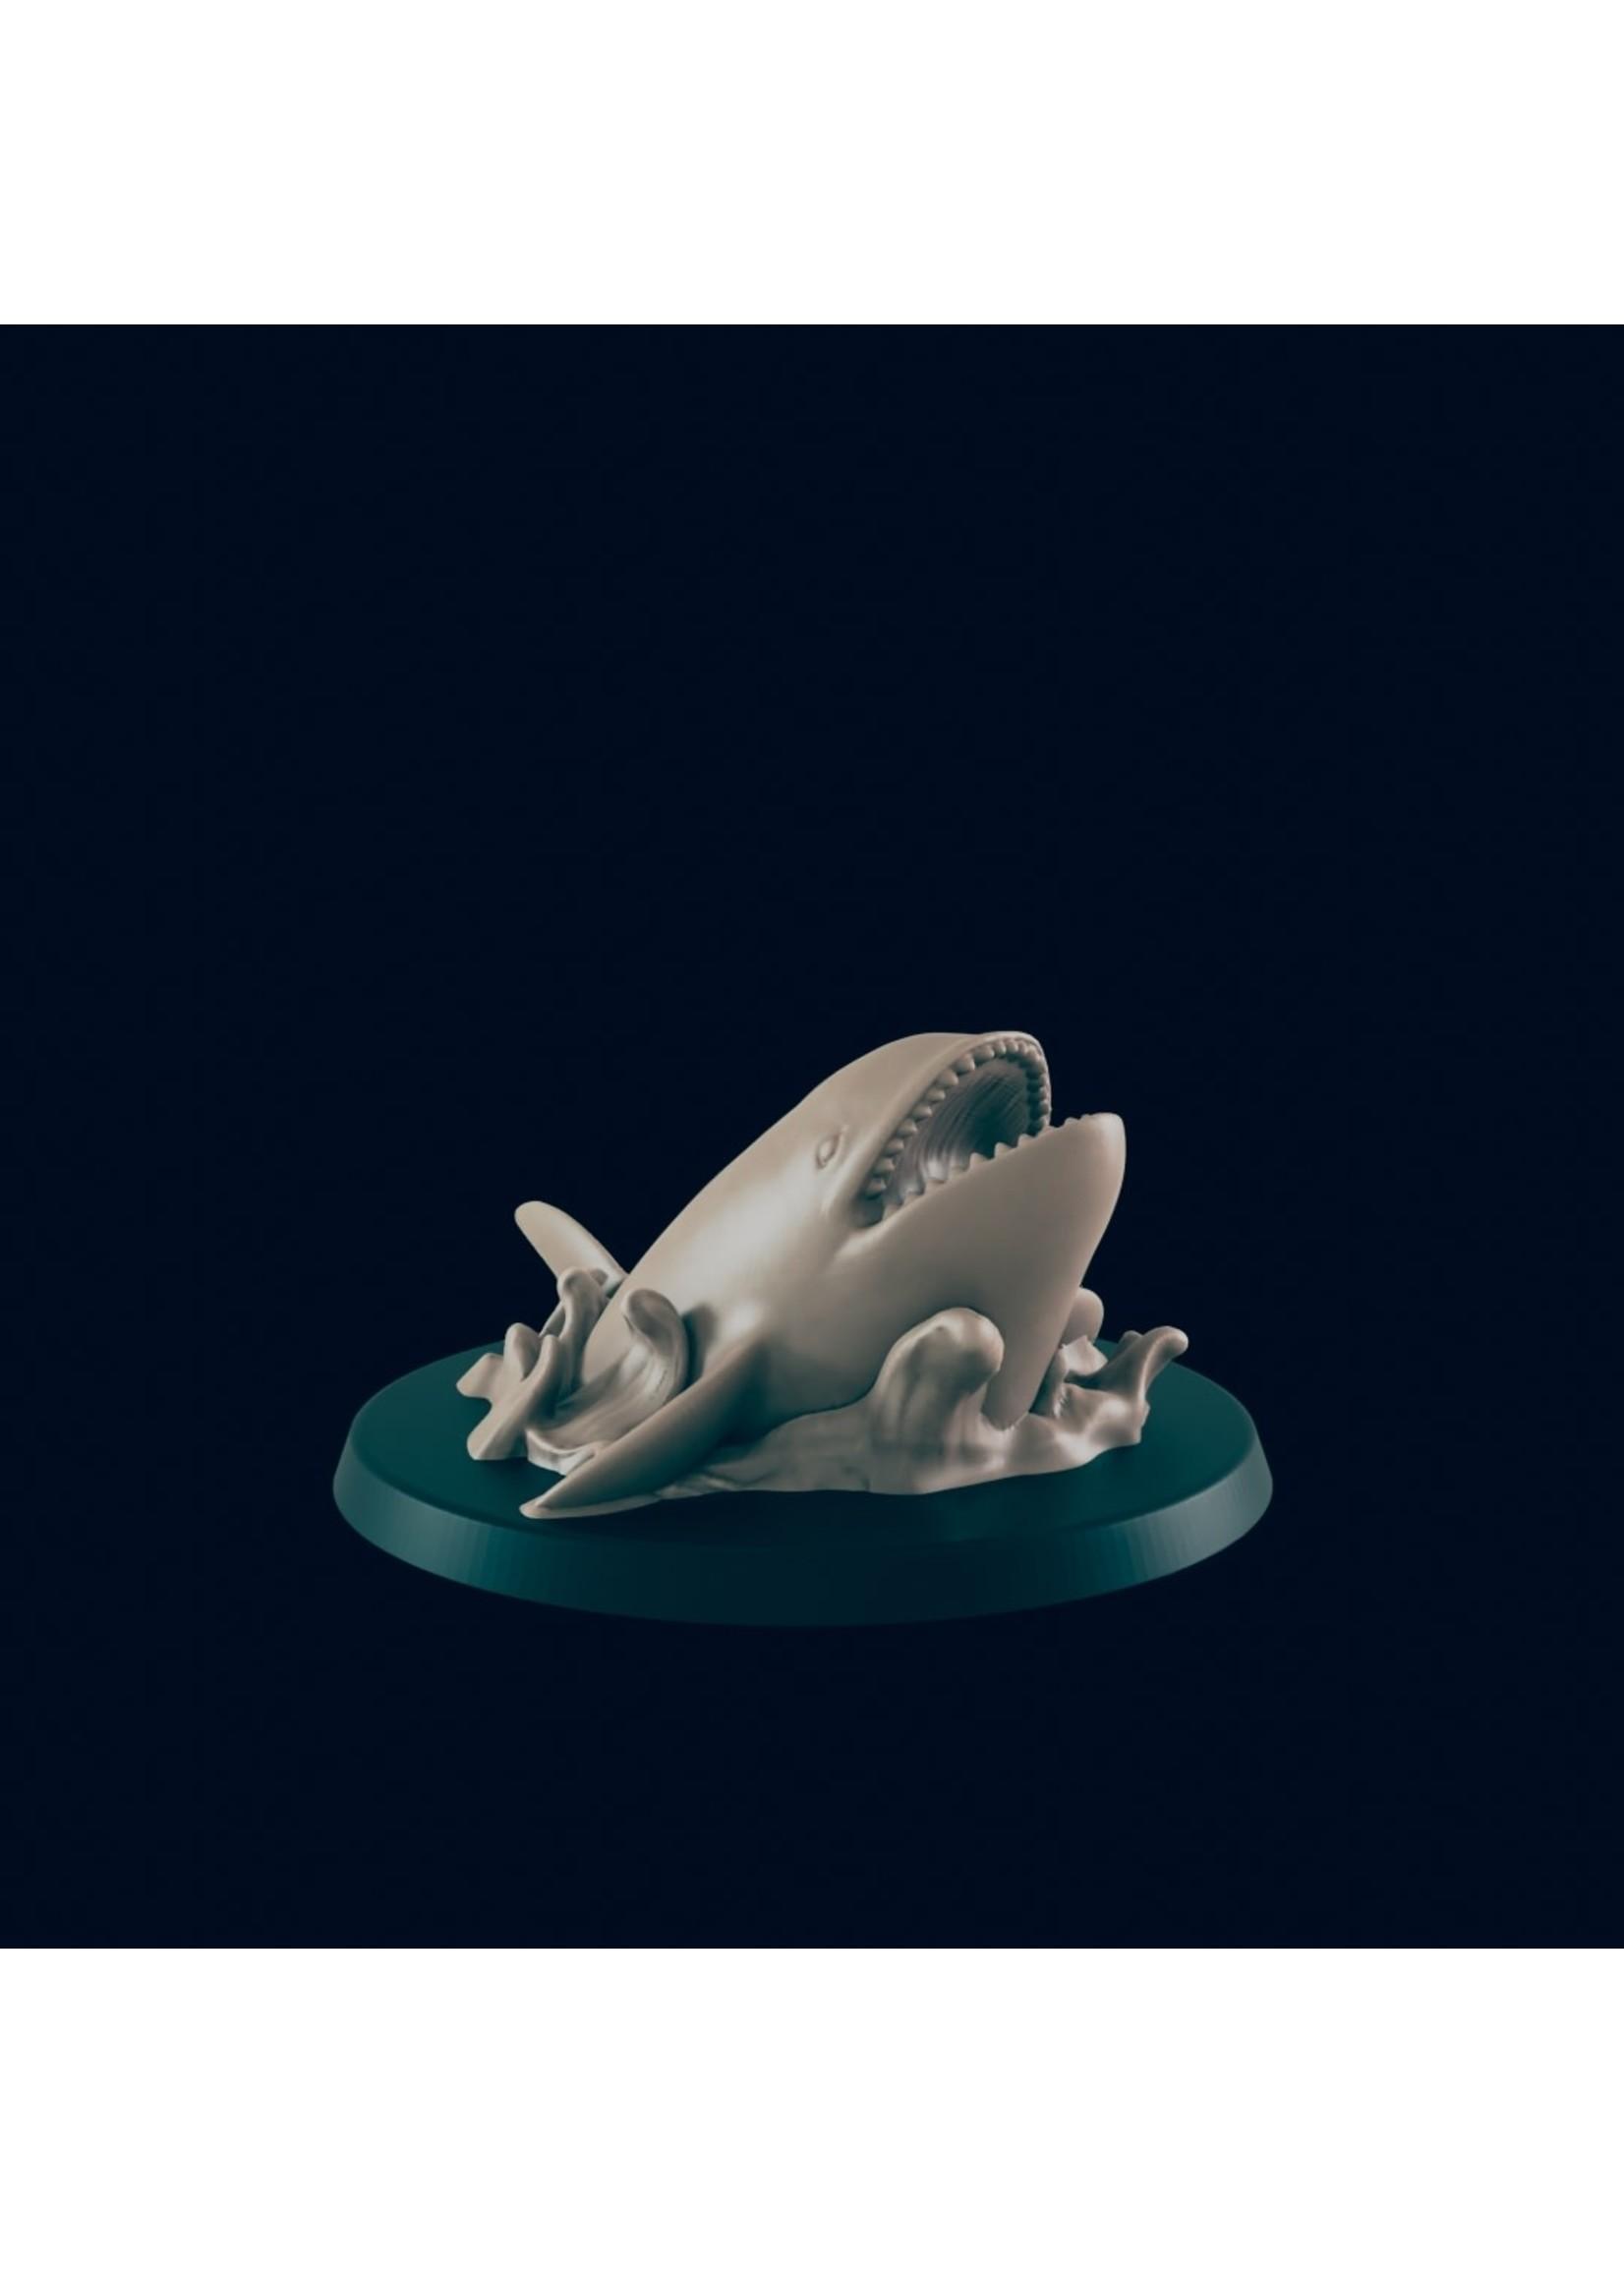 3D Printed Miniature - Orca - Dungeons & Dragons - Beasts and Baddies KS